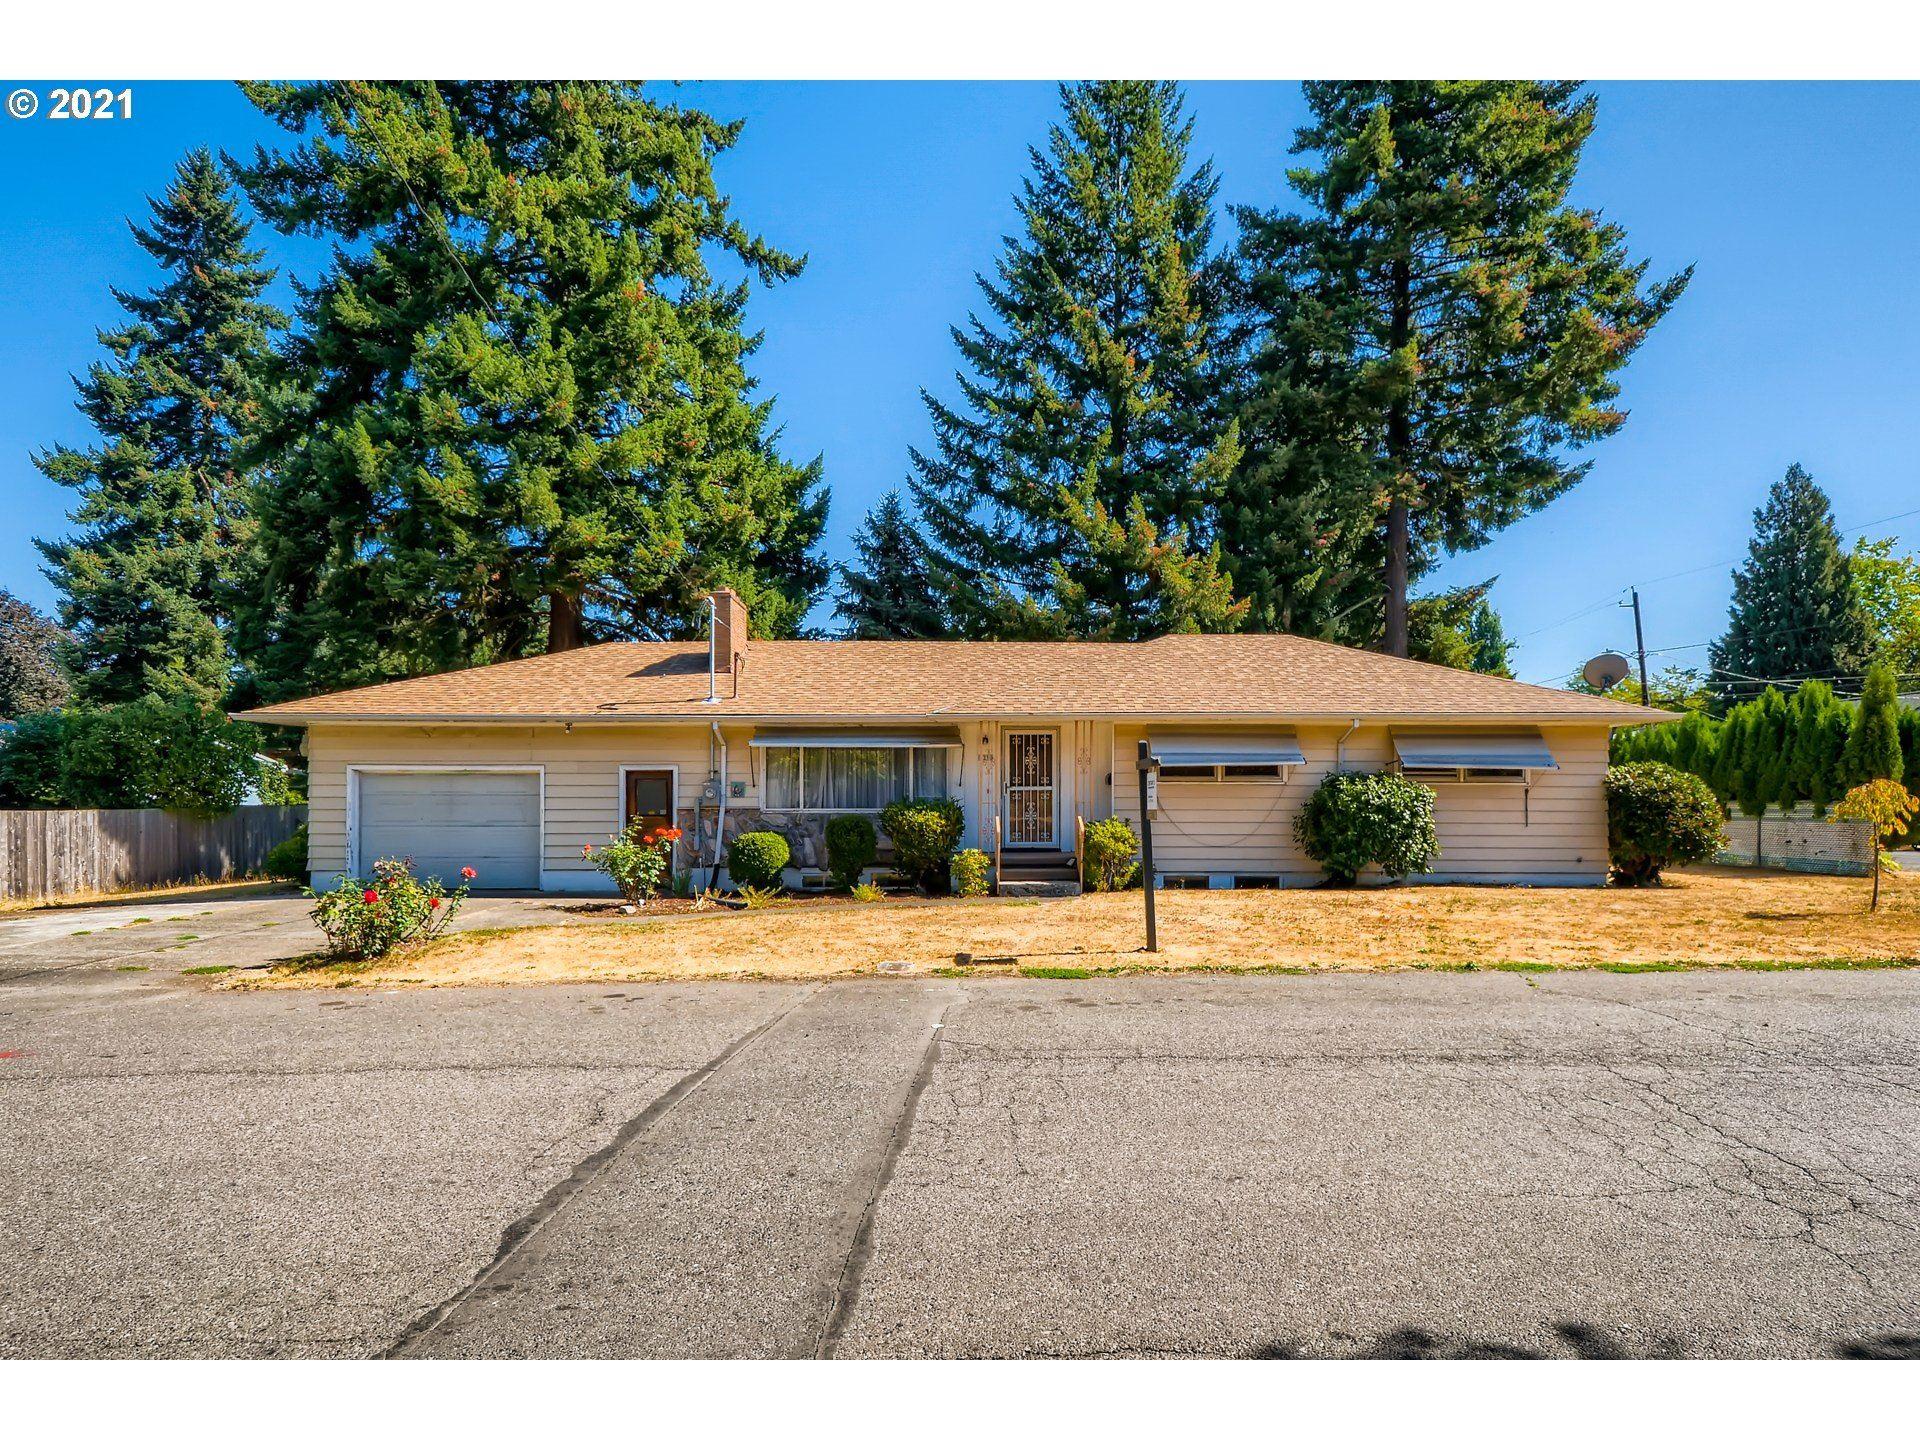 5210 NE 57TH AVE, Portland, OR 97218 - MLS#: 21491436